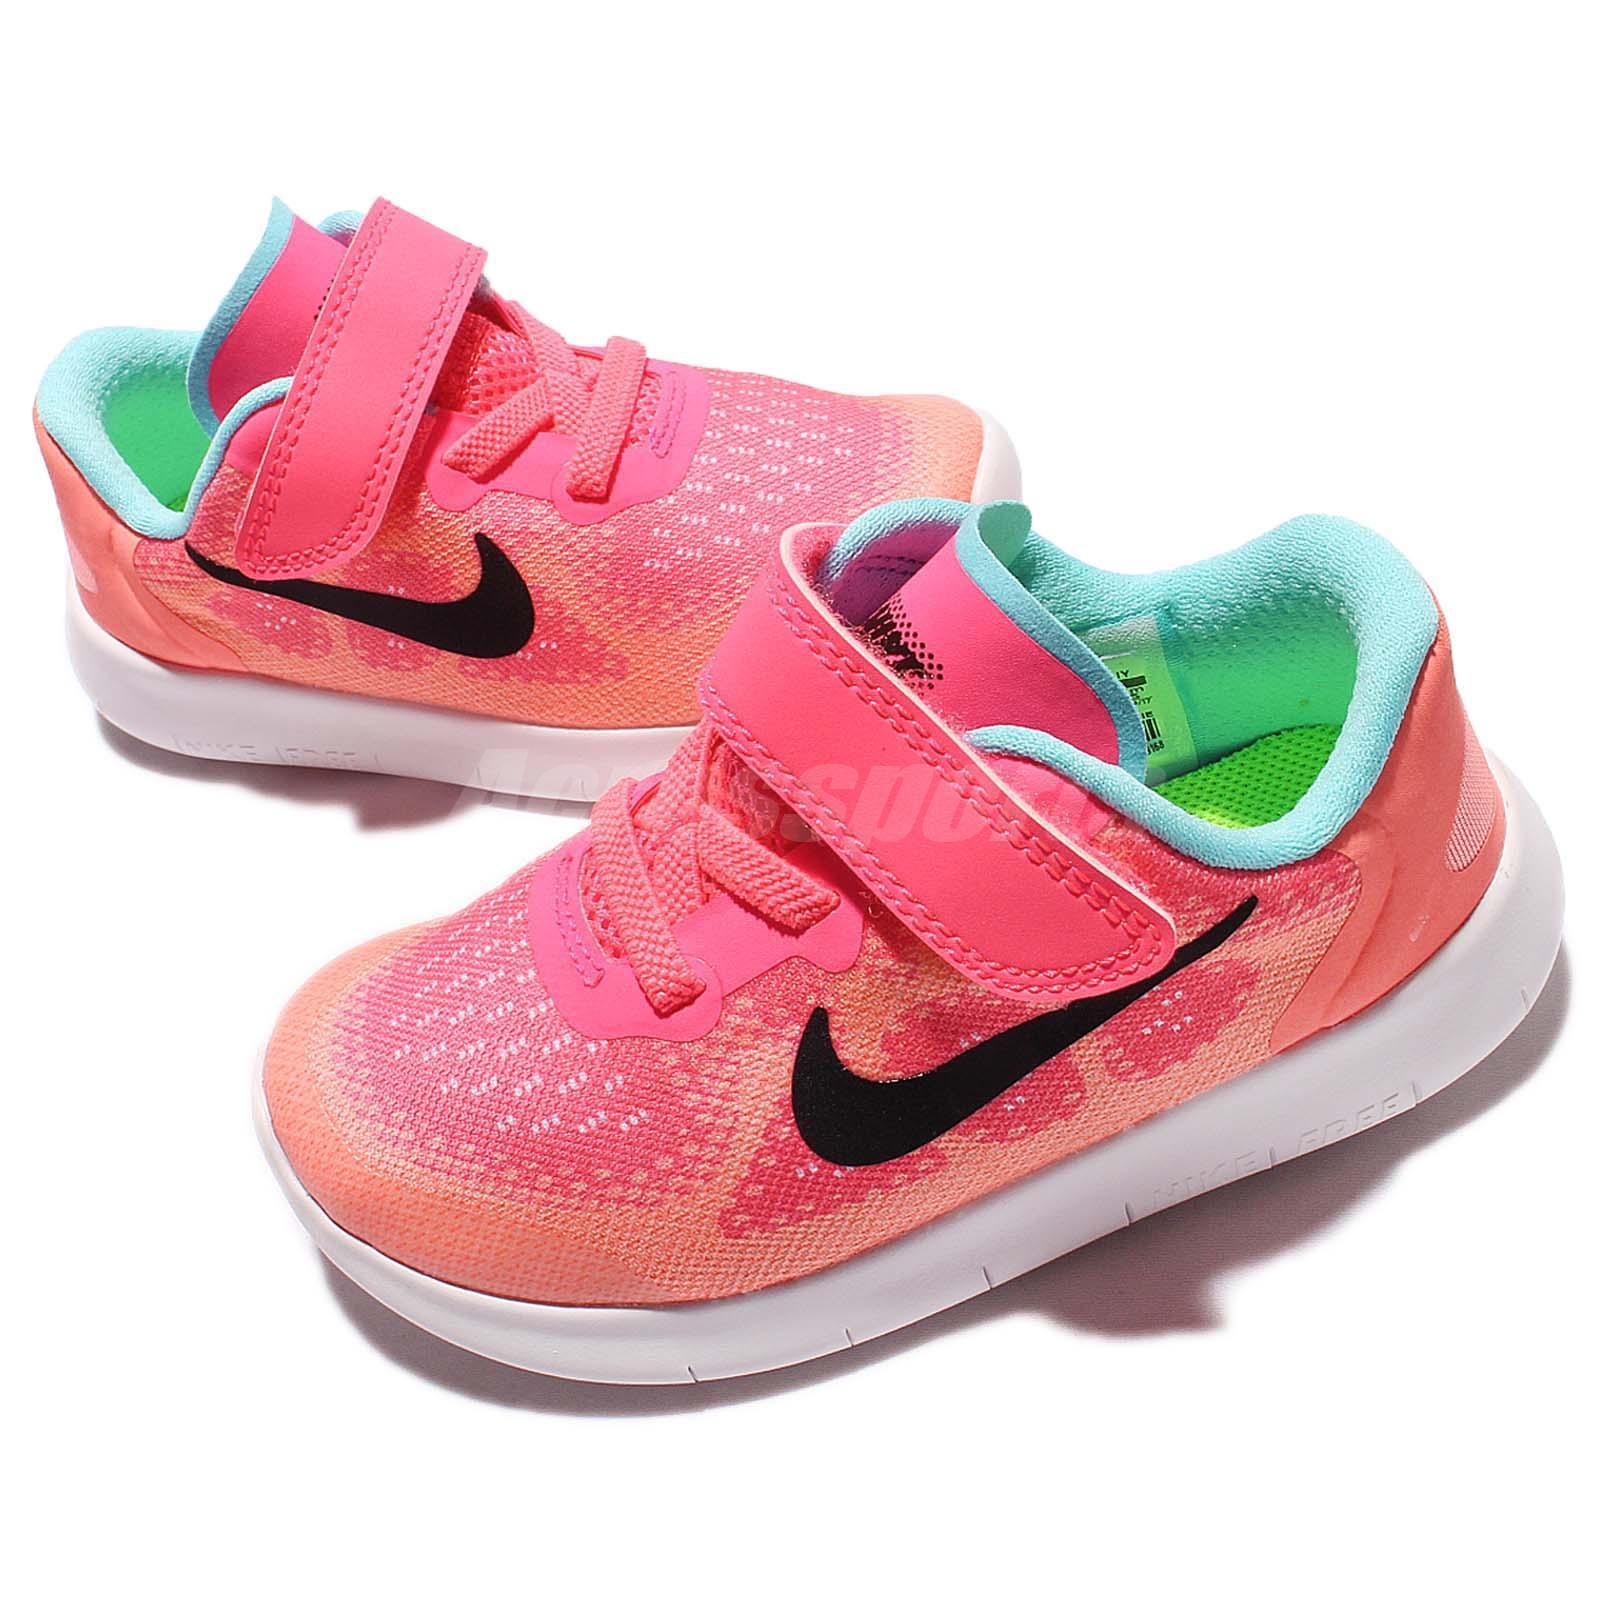 Custom Nike Toddler Shoes